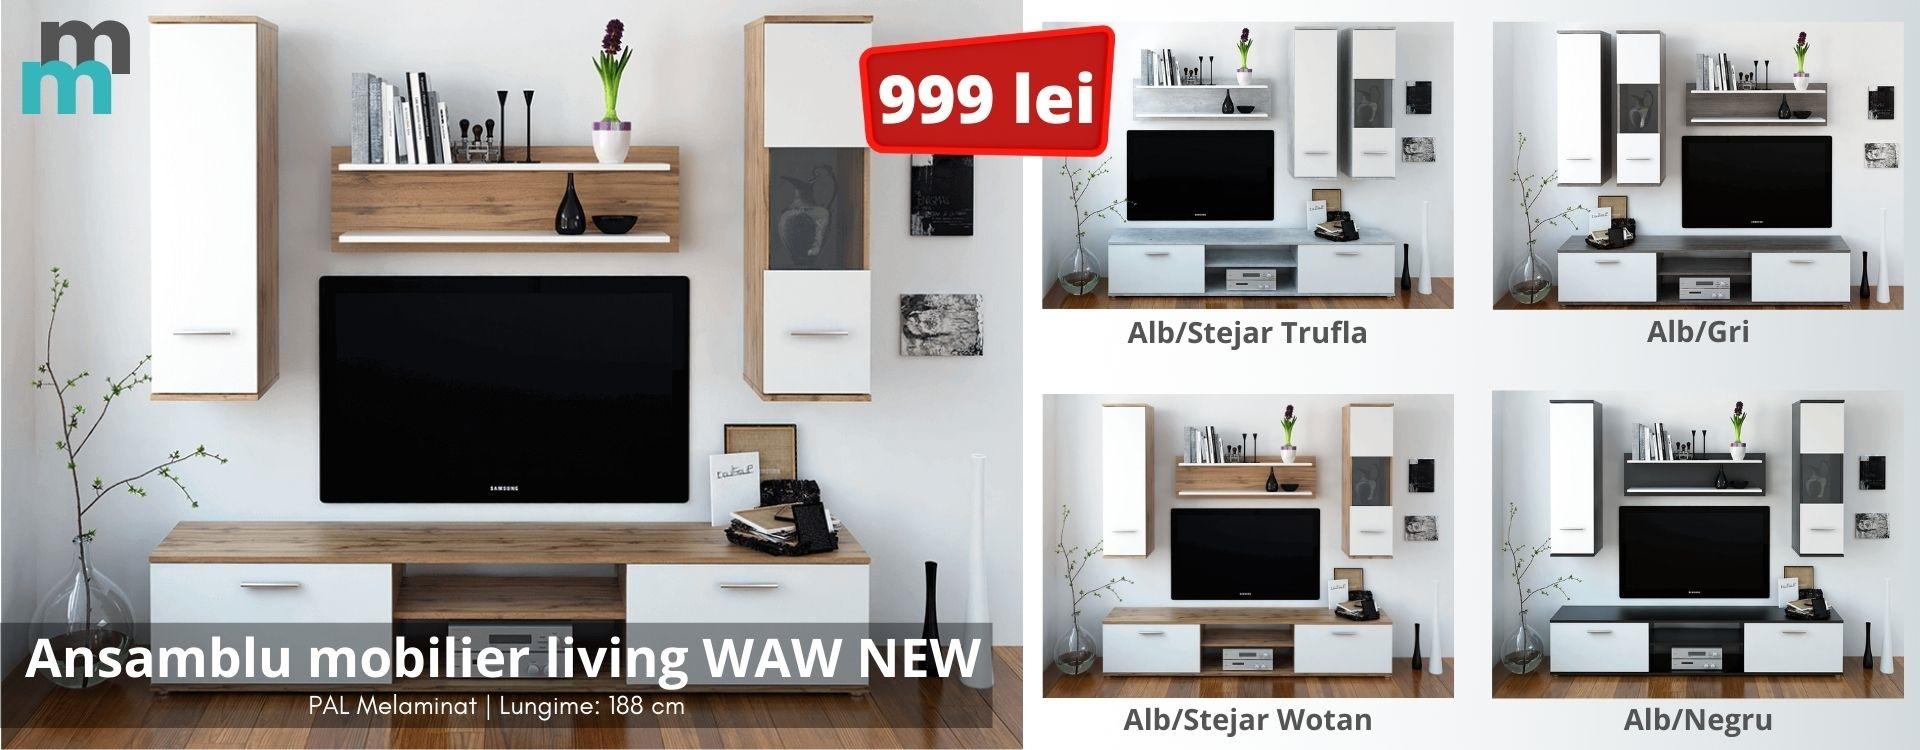 Ansamblu mobilier living WAW NEW